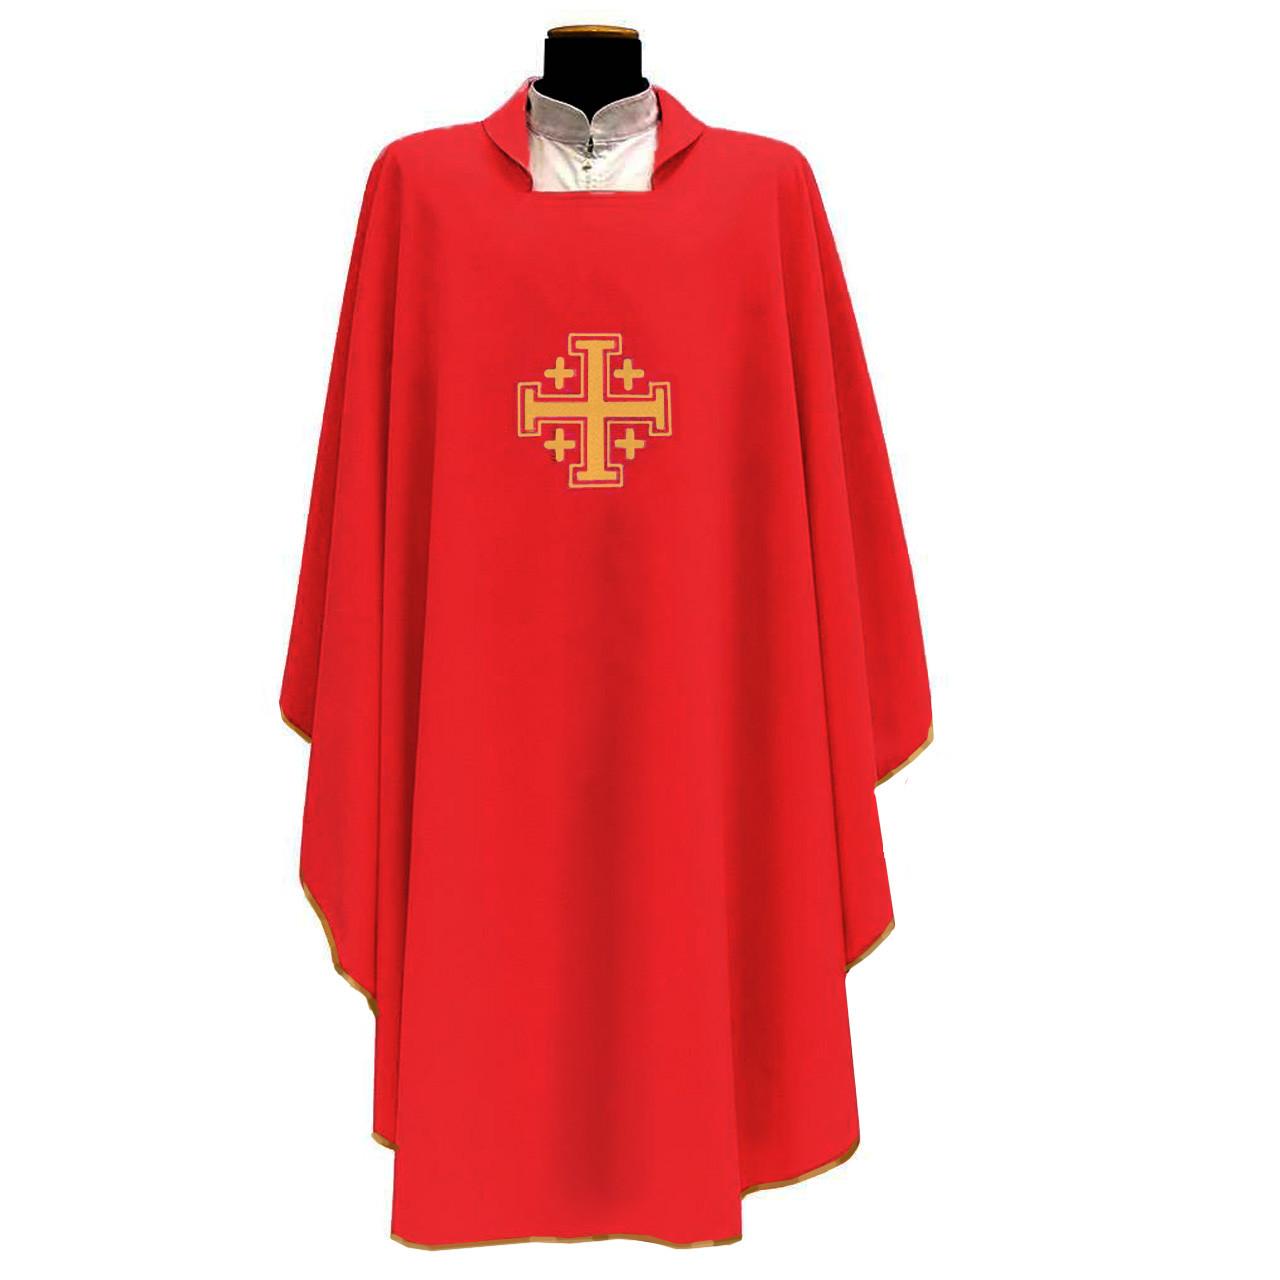 137 Chasuble in Red Primavera